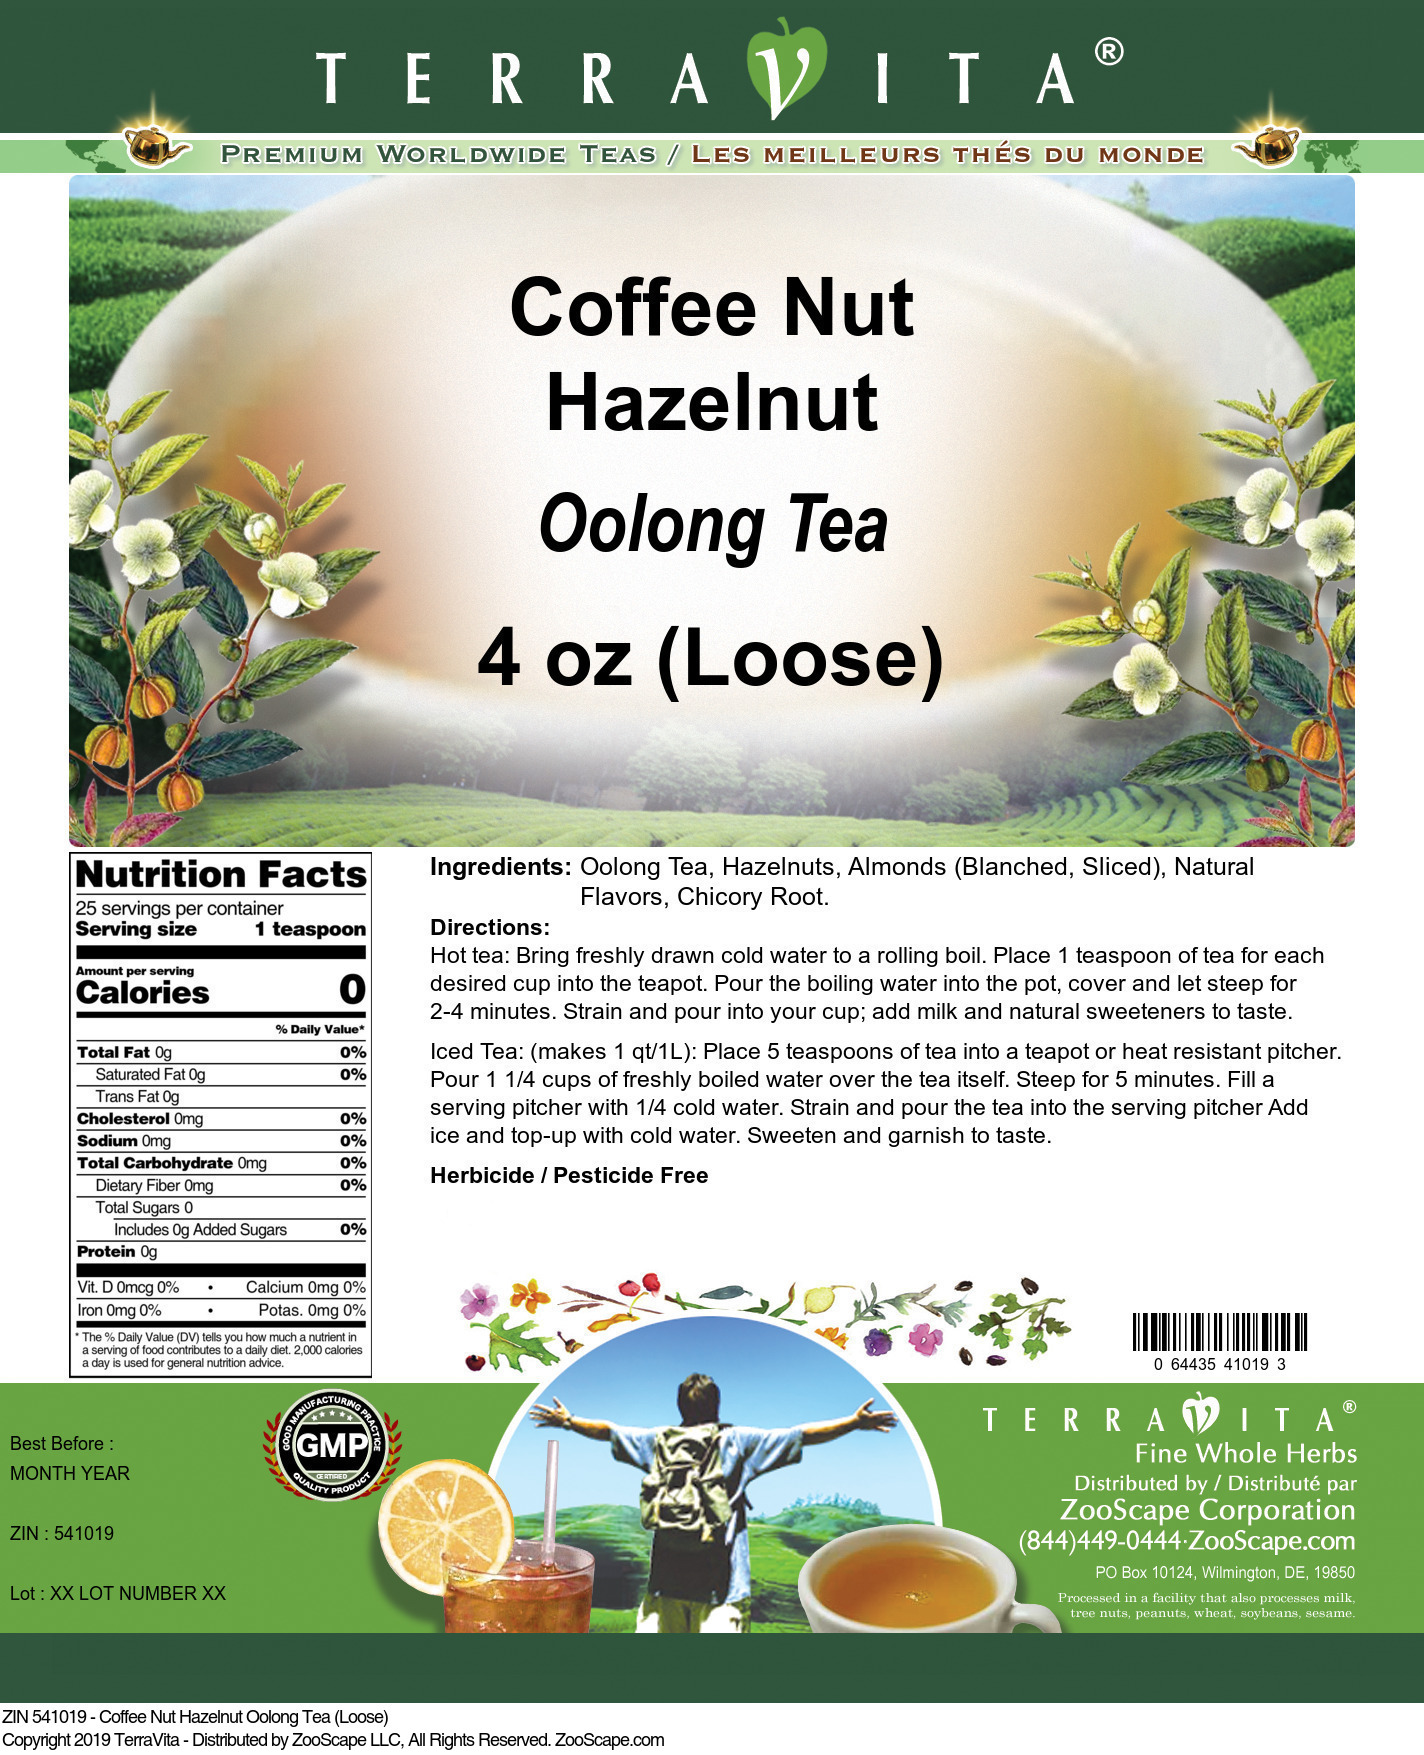 Coffee Nut Hazelnut Oolong Tea (Loose)